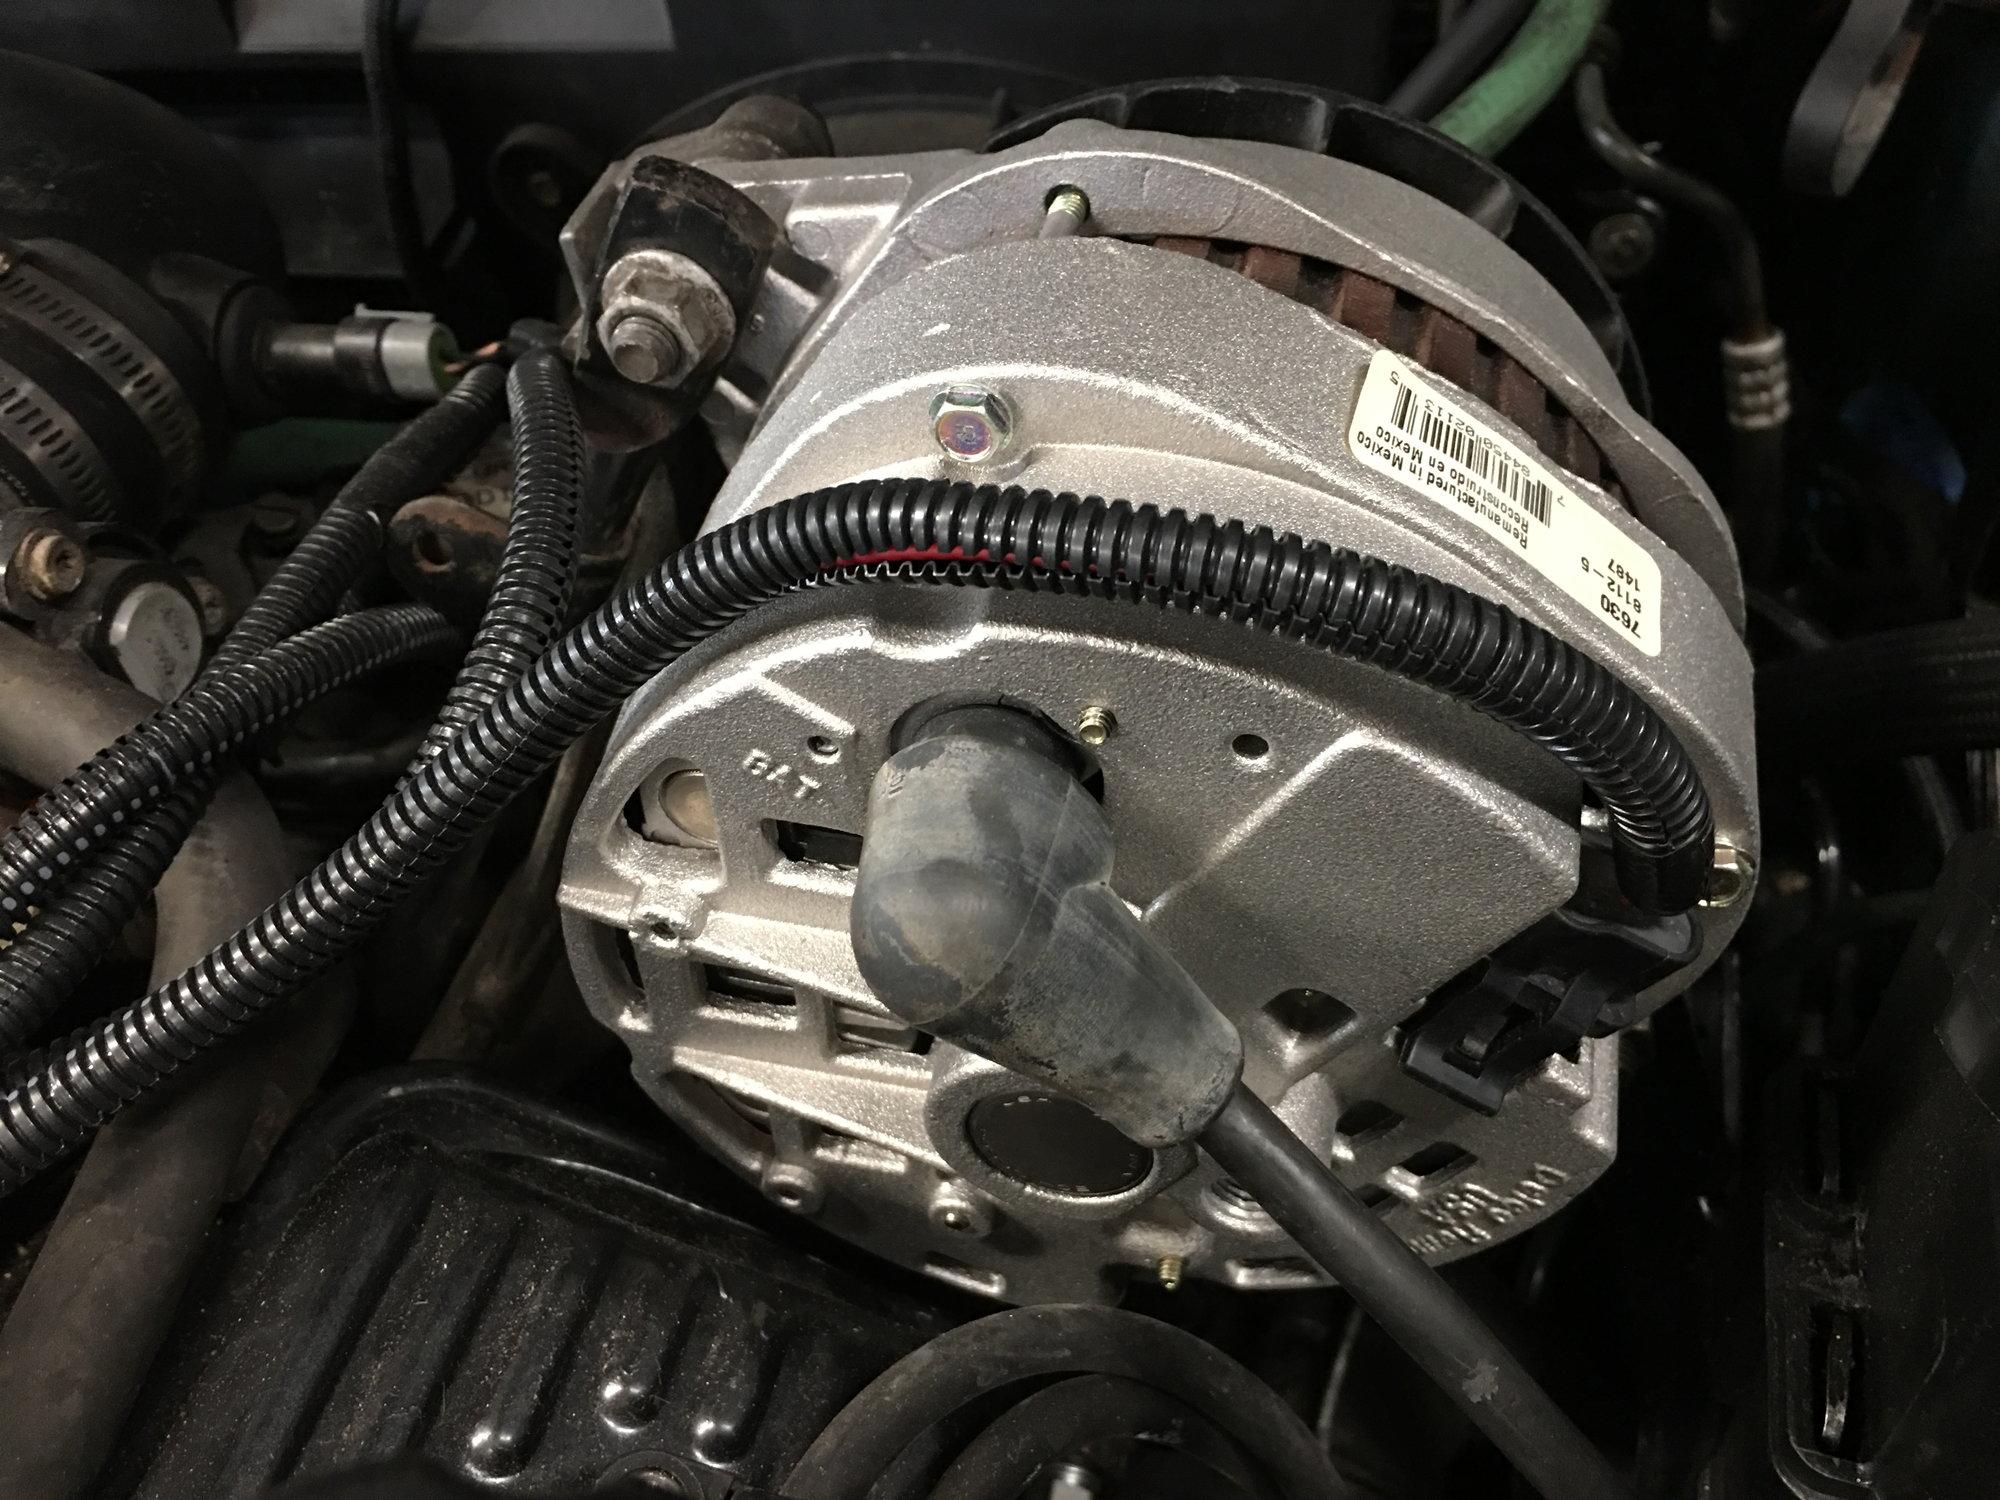 5.3 vs LS1 alternator wiring? - LS1TECH - Camaro and ... Jeep Tj Alternator Wiringhtml on